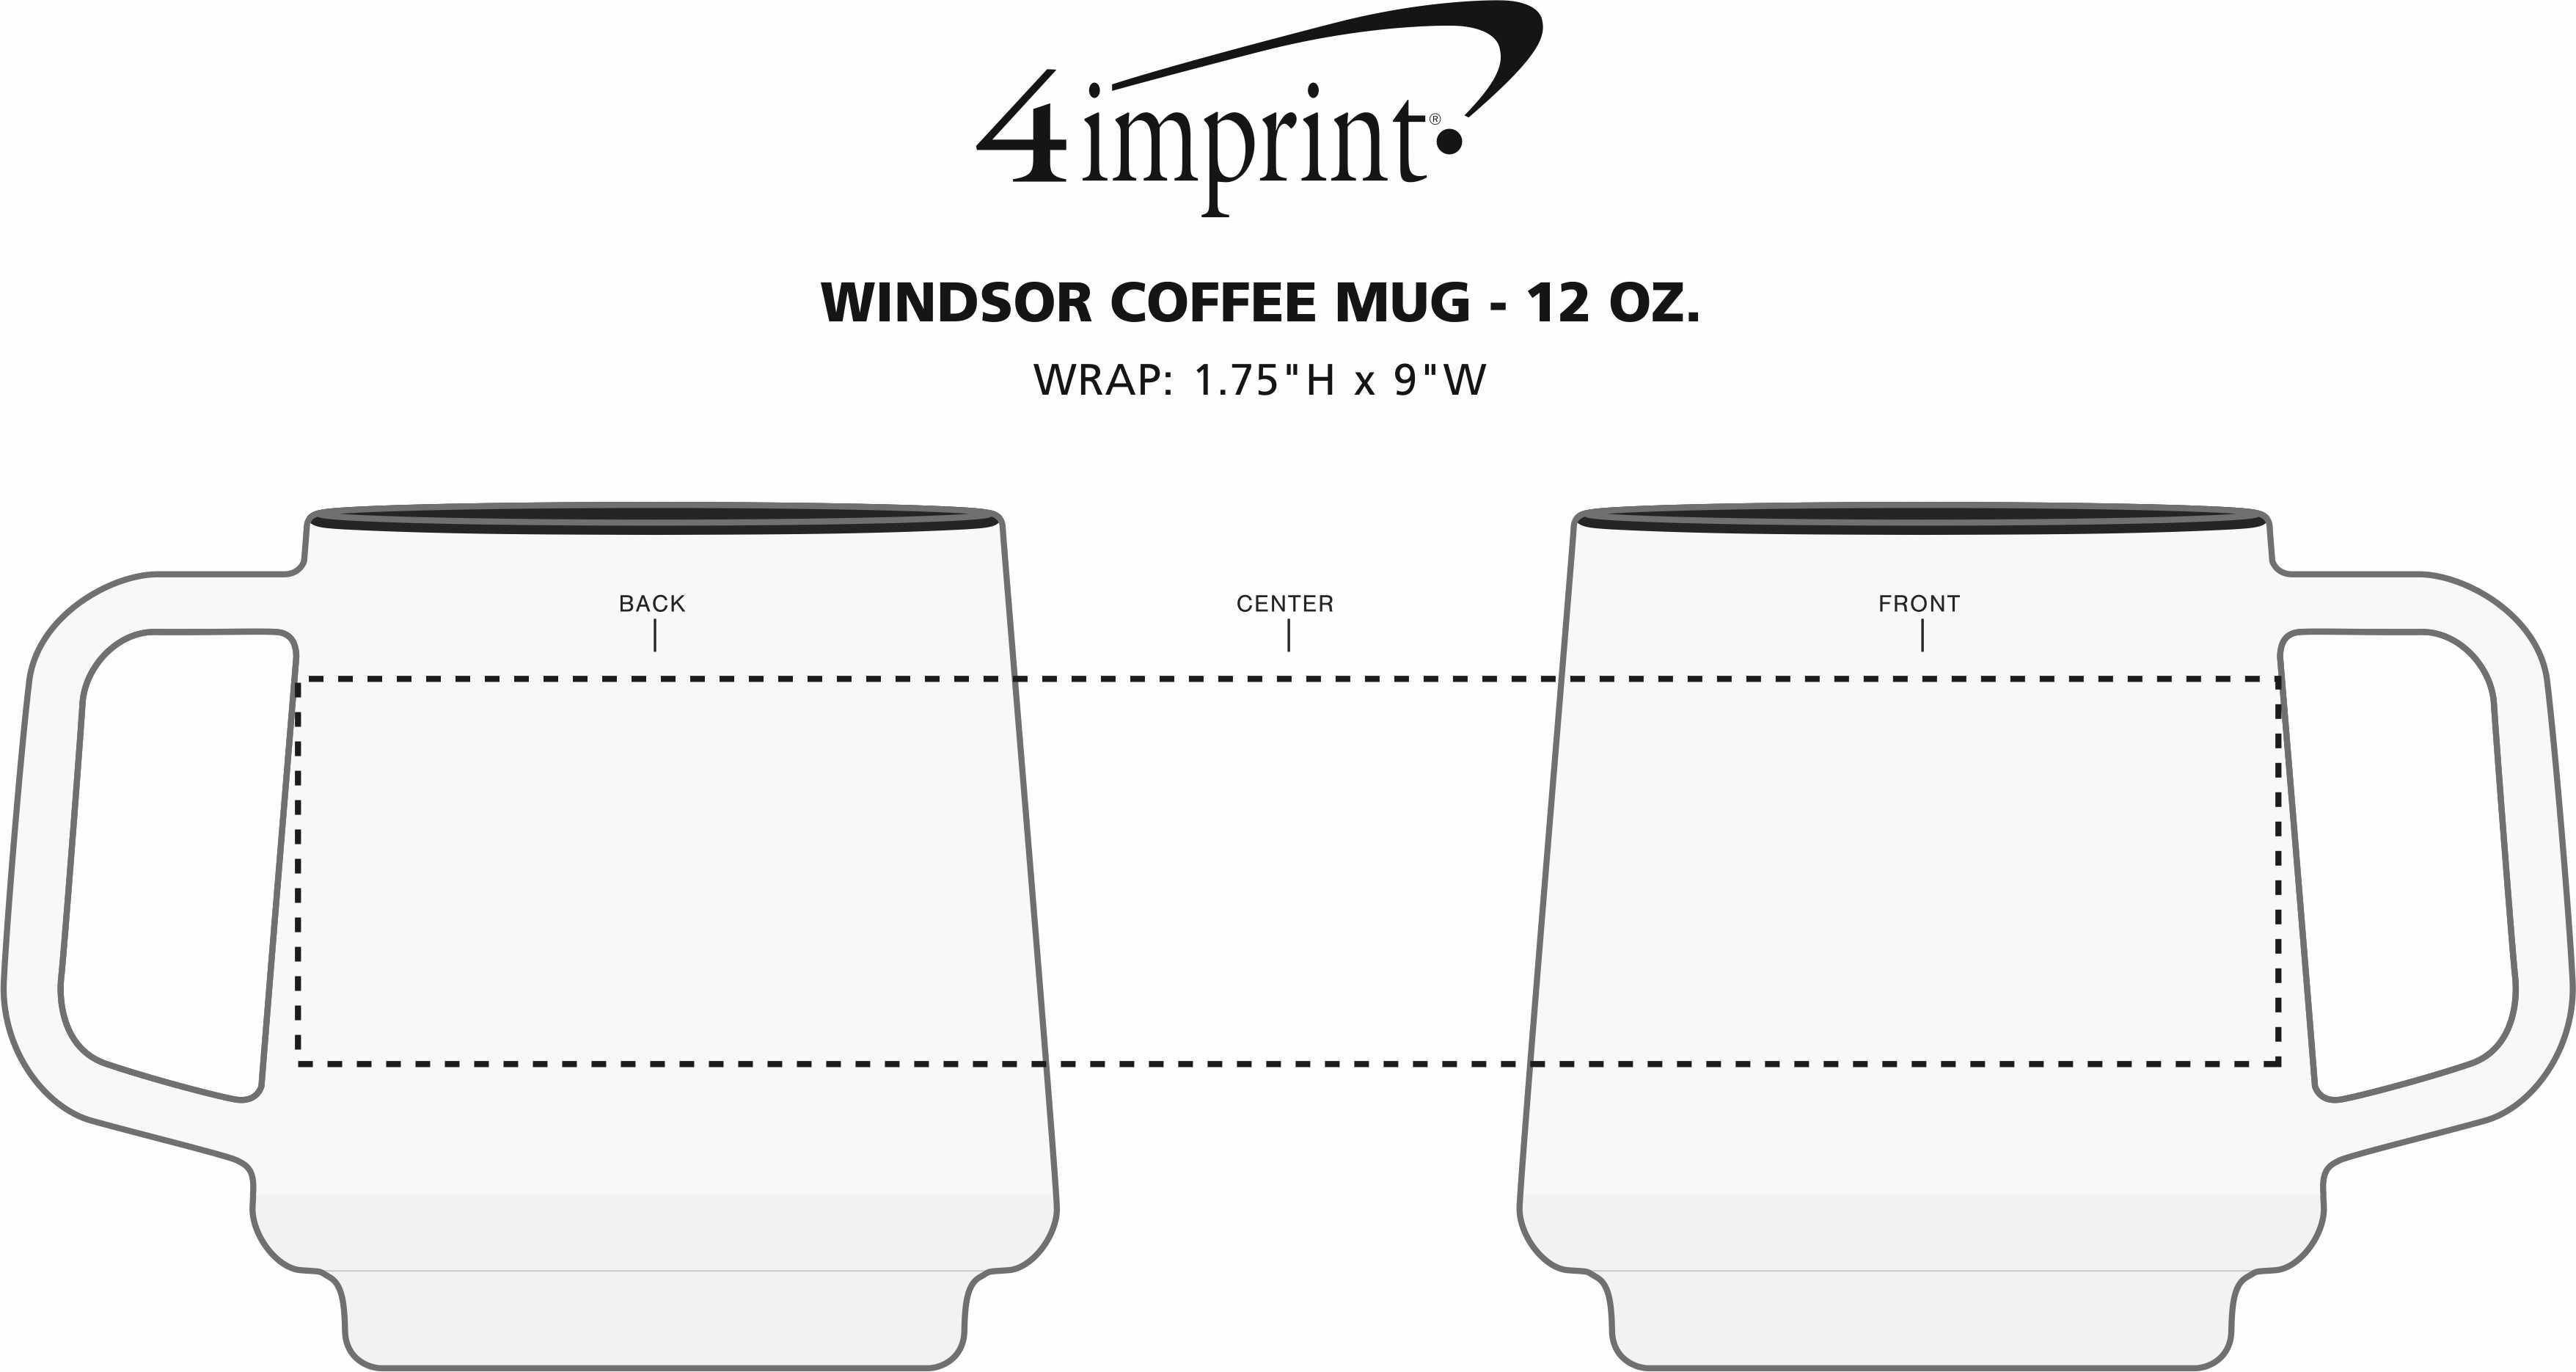 Imprint Area of Windsor Coffee Mug - 12 oz.